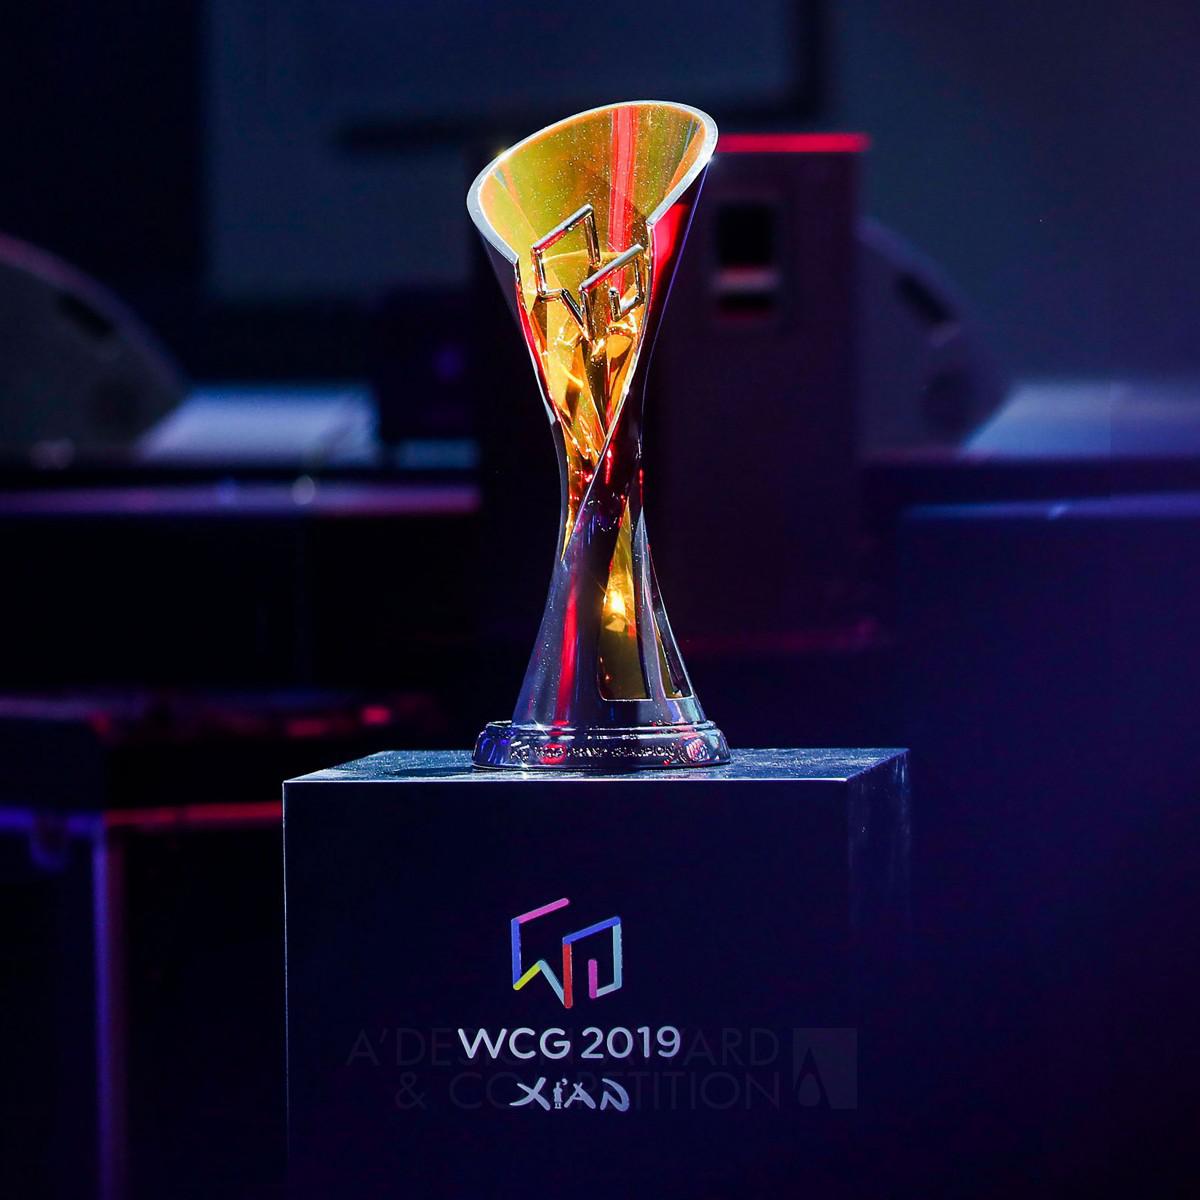 WCG Champions Trophy